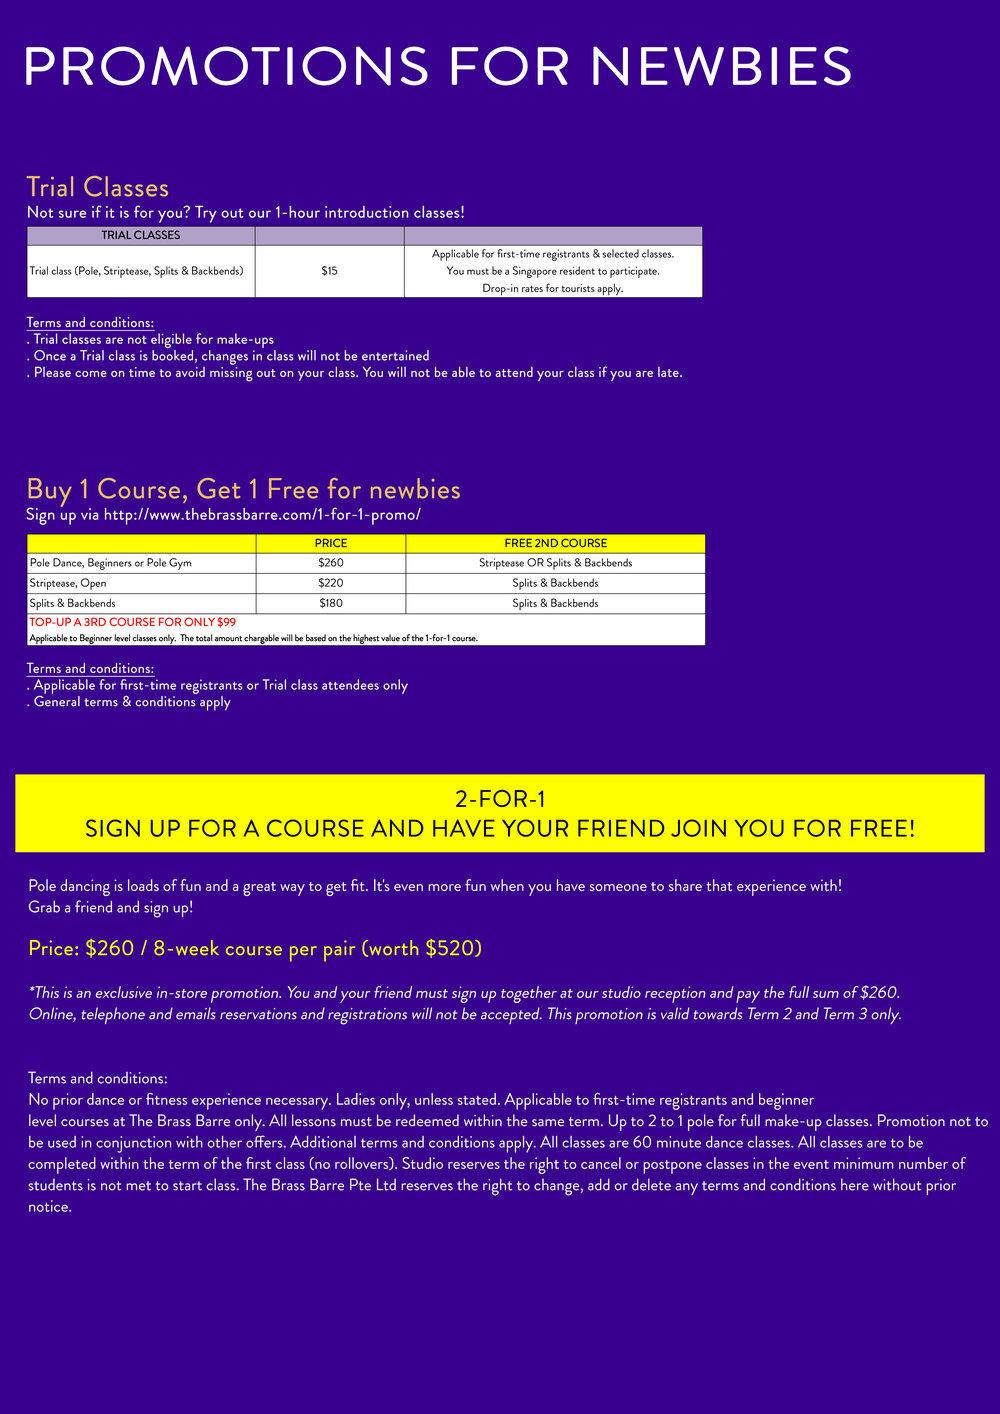 Rate Card 2018 - Newbies.jpg